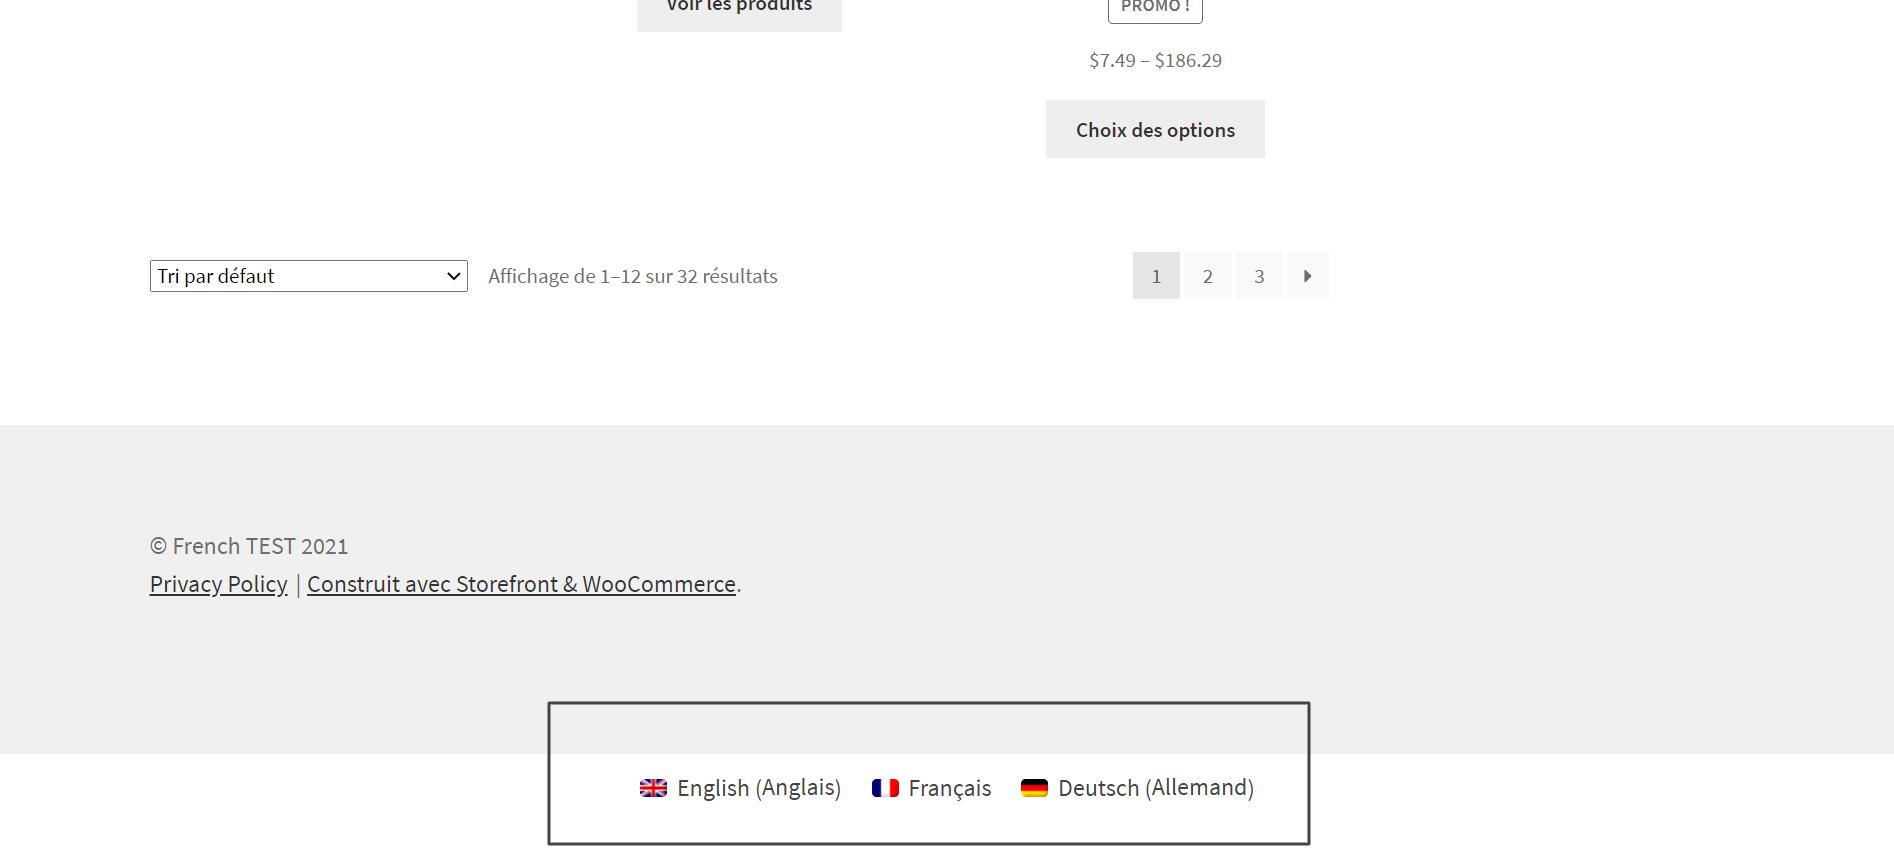 Produits-–-French-TEST